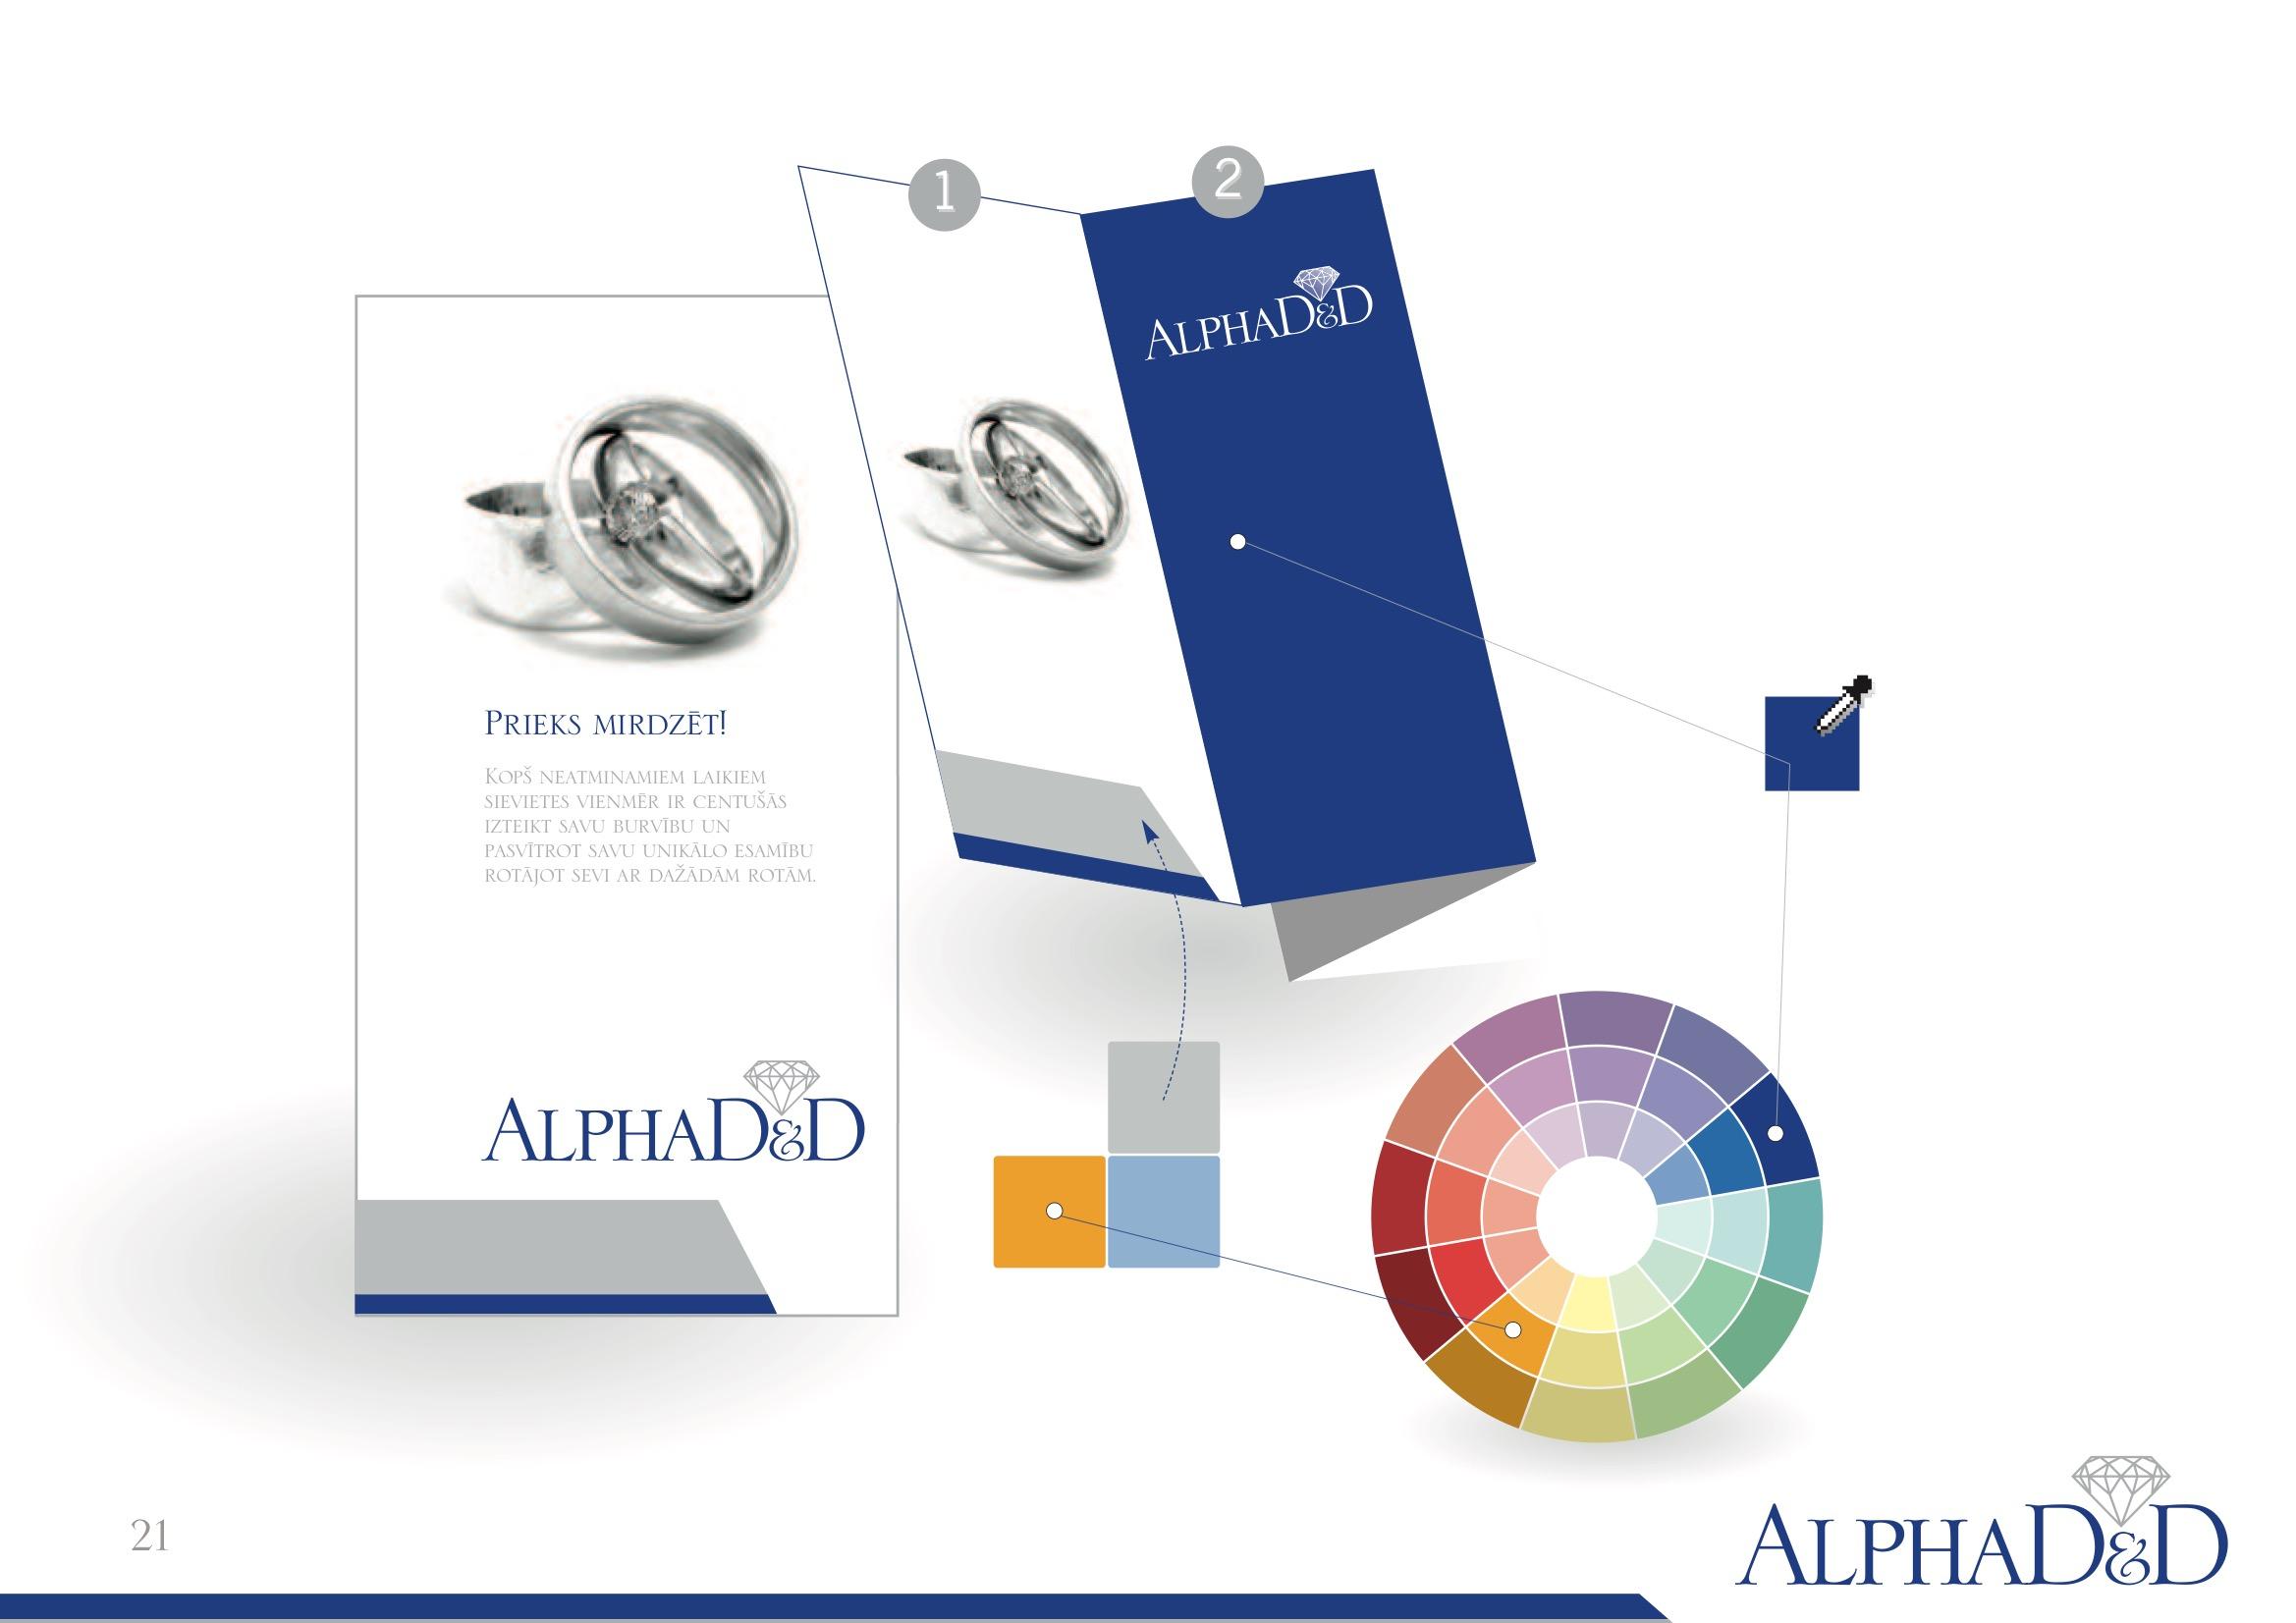 AlphaDD_Stils 21